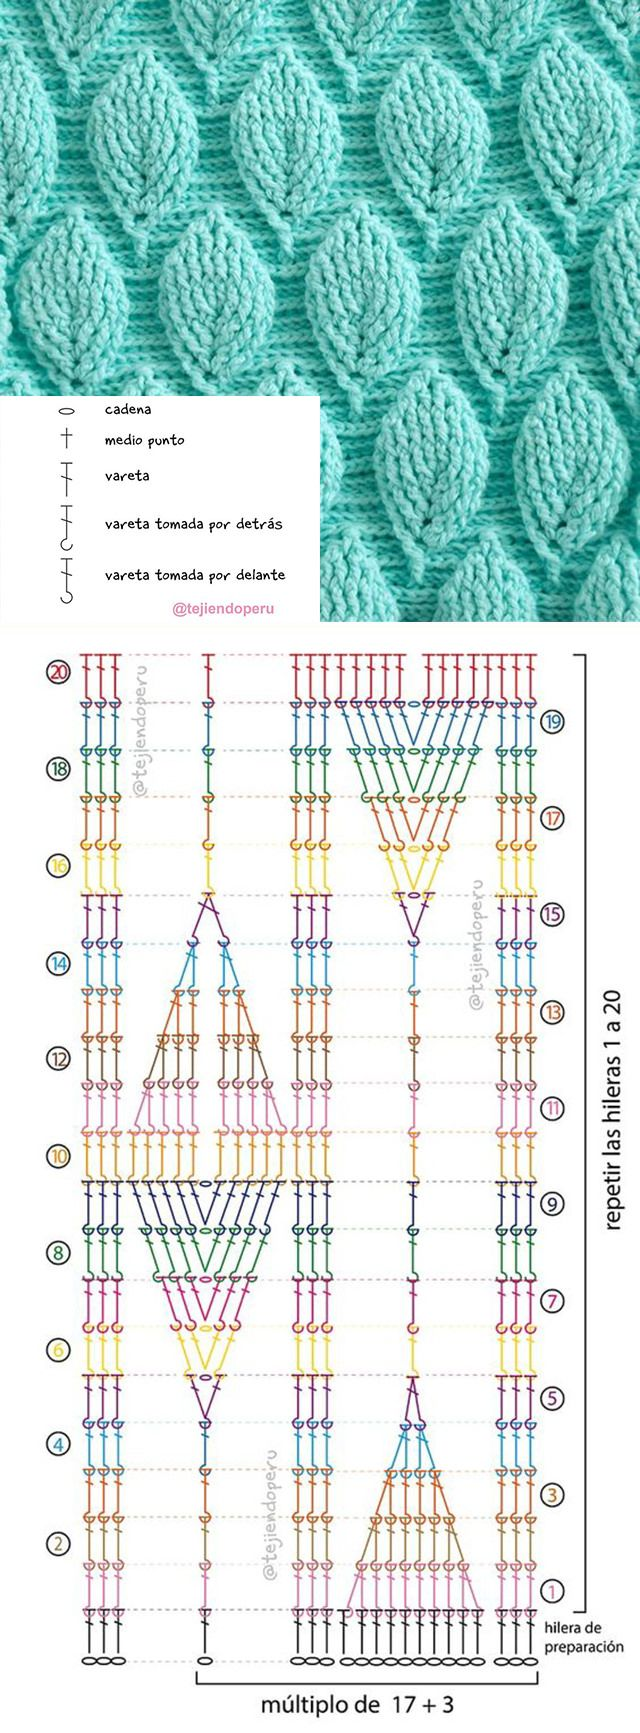 3D Leaf Stitch Crochet Pattern | crochet puntos | Pinterest ...